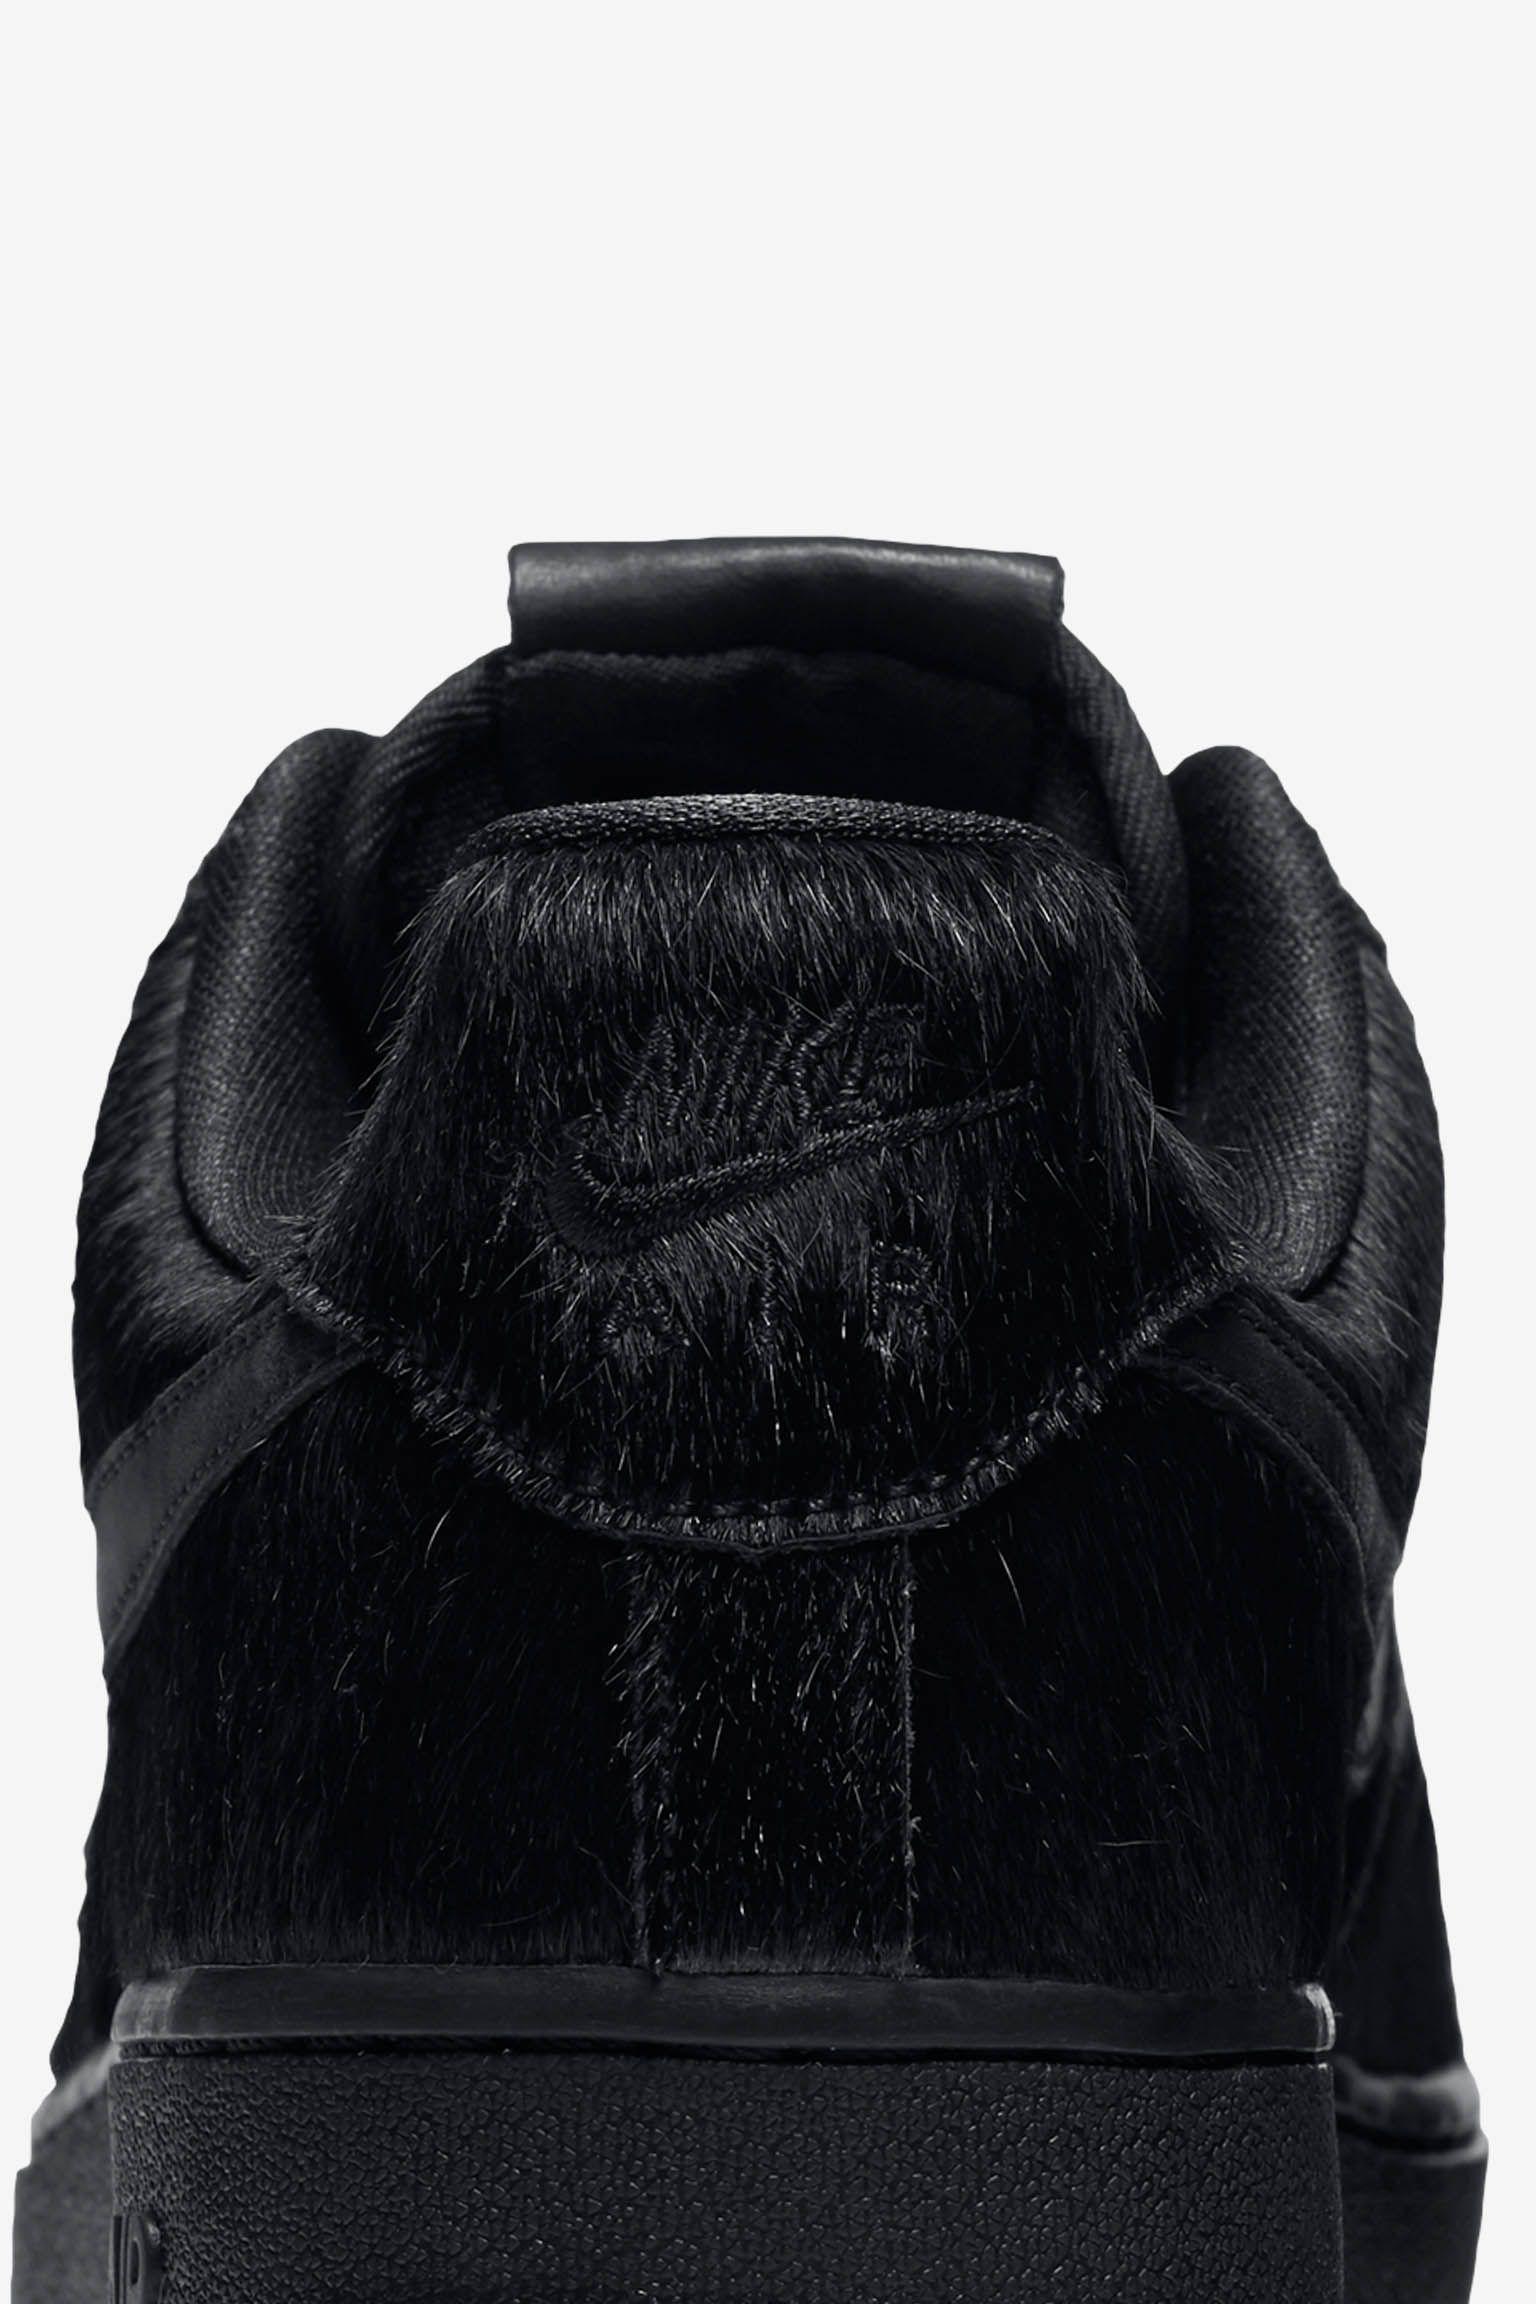 Women's Nike Air Force 1 Low 07 Premium 'Triple Black' 2016